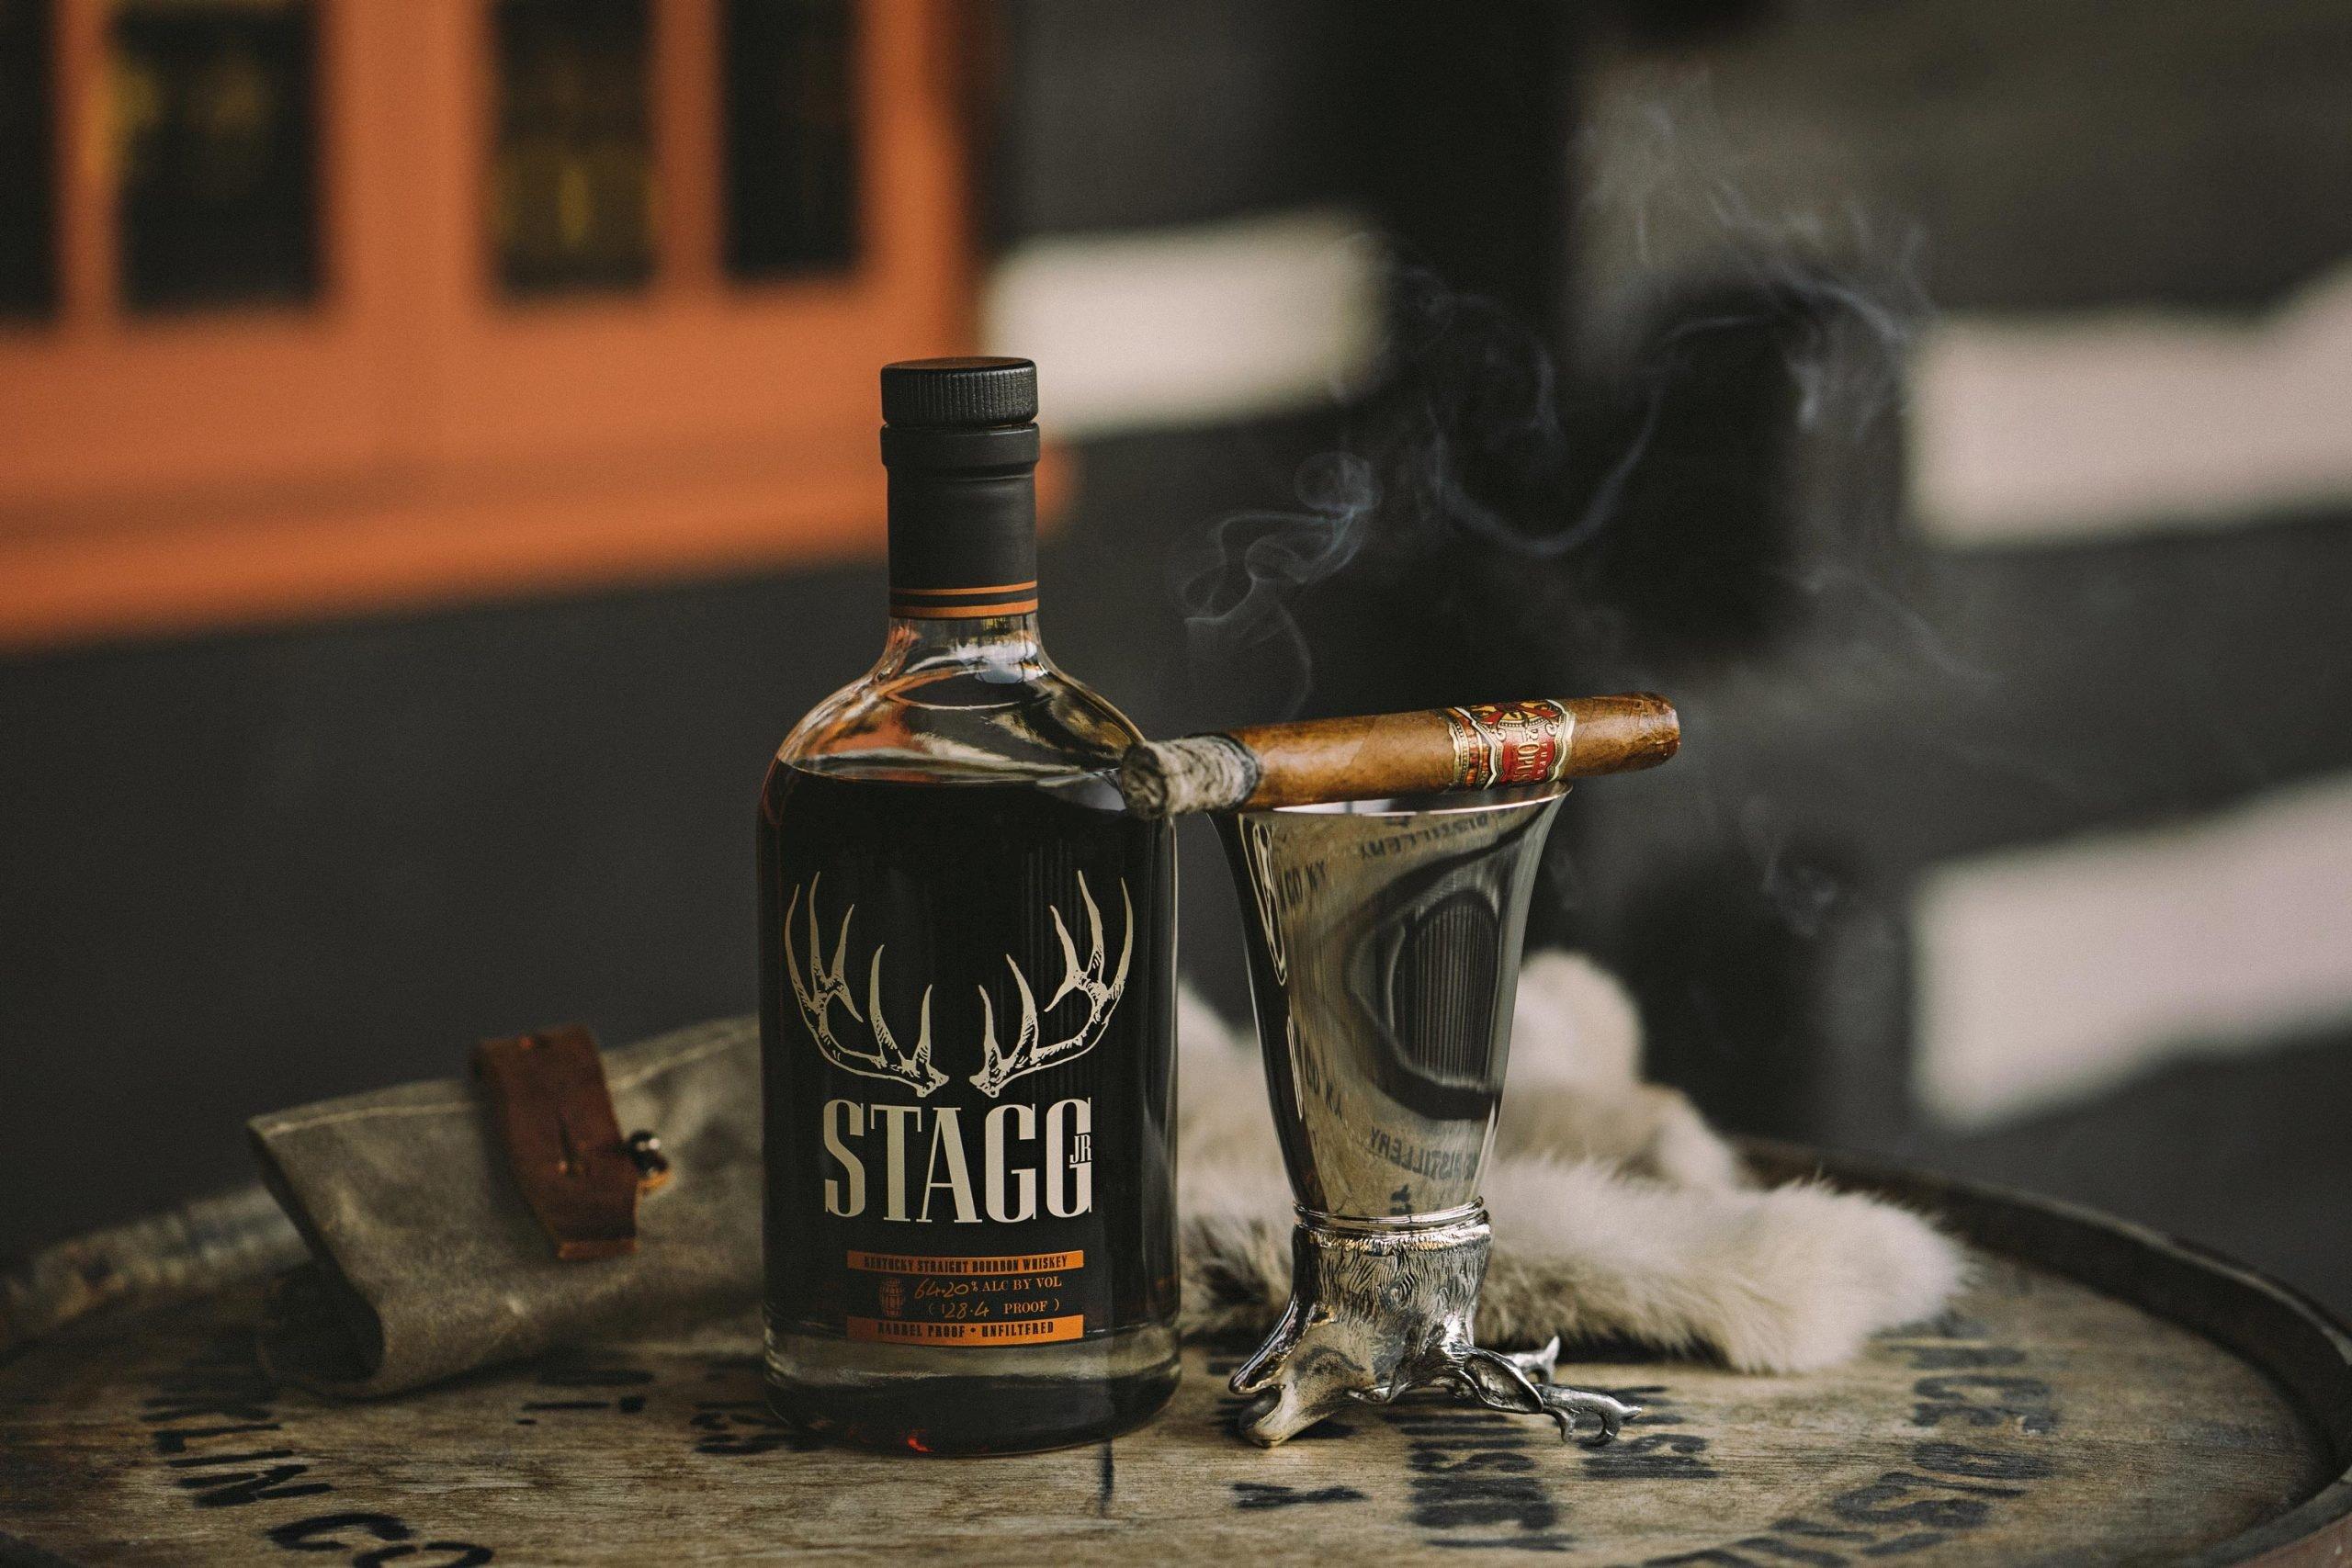 Stagg Jr. Bourbon Batch #13 (2020)